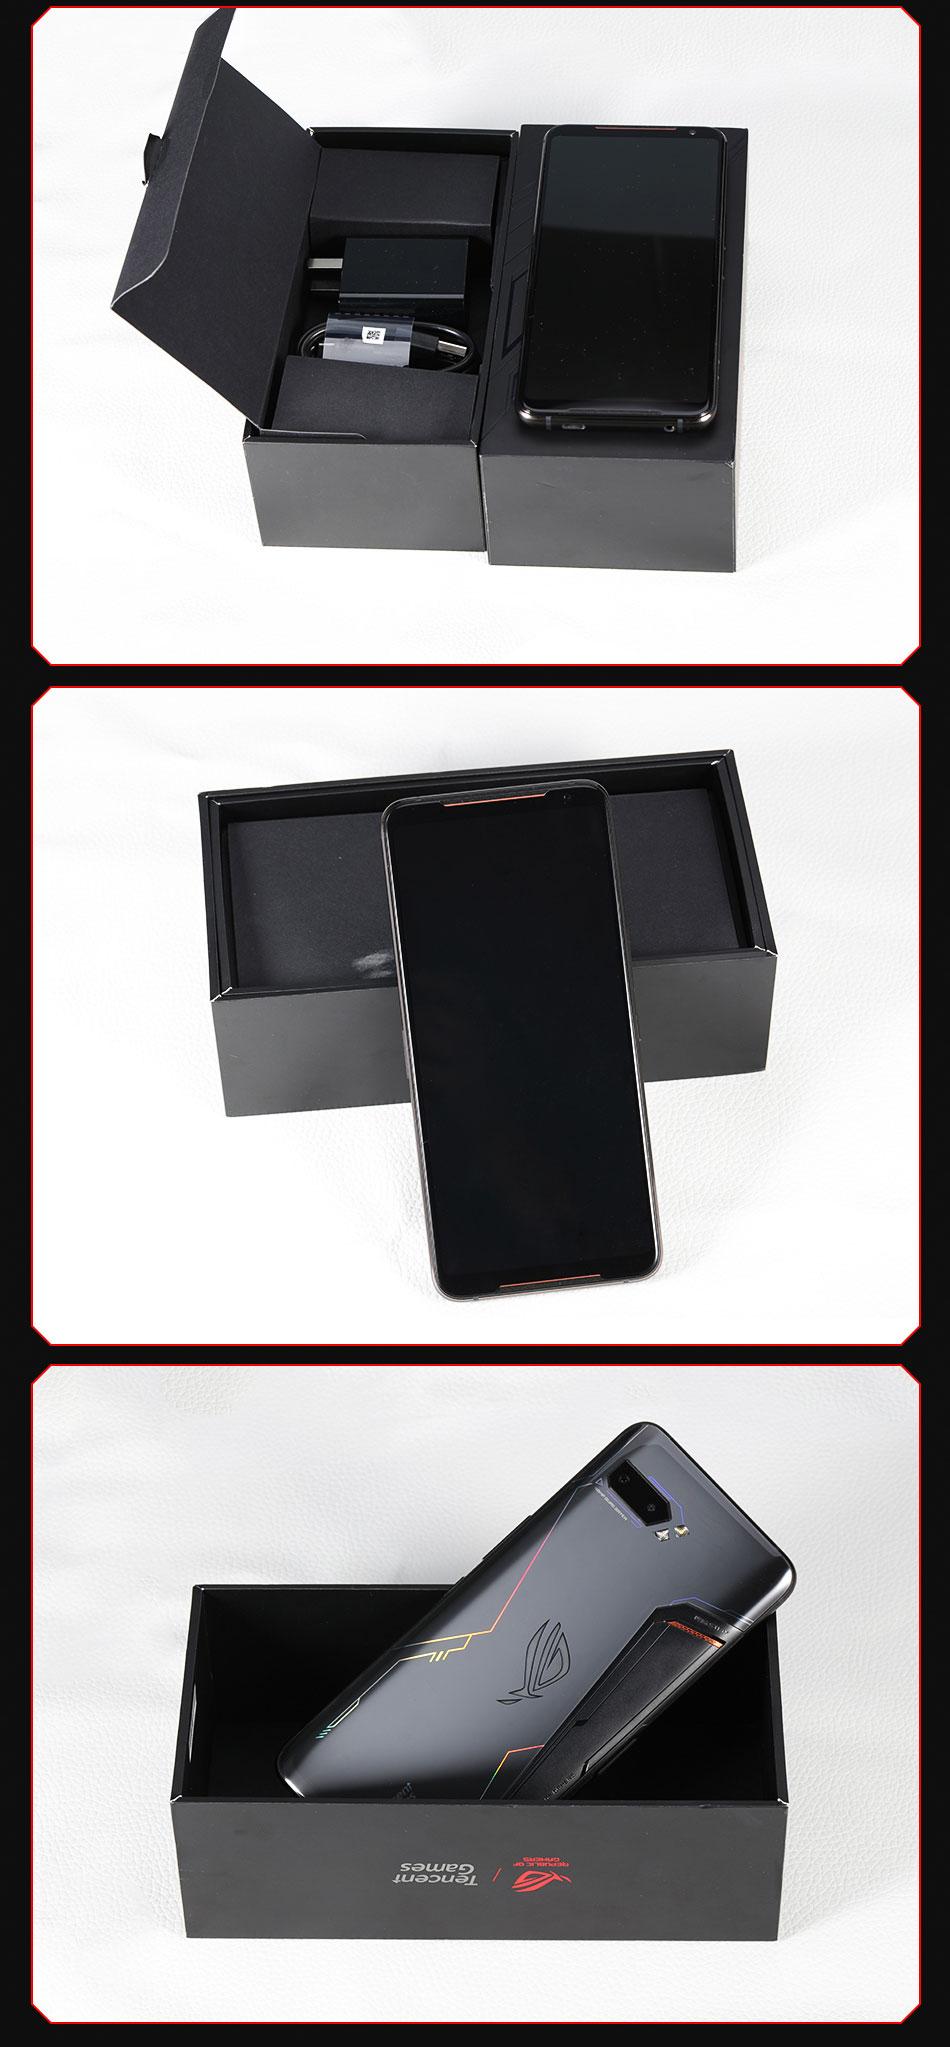 Asus ROG teléfono II ZS660KL 4